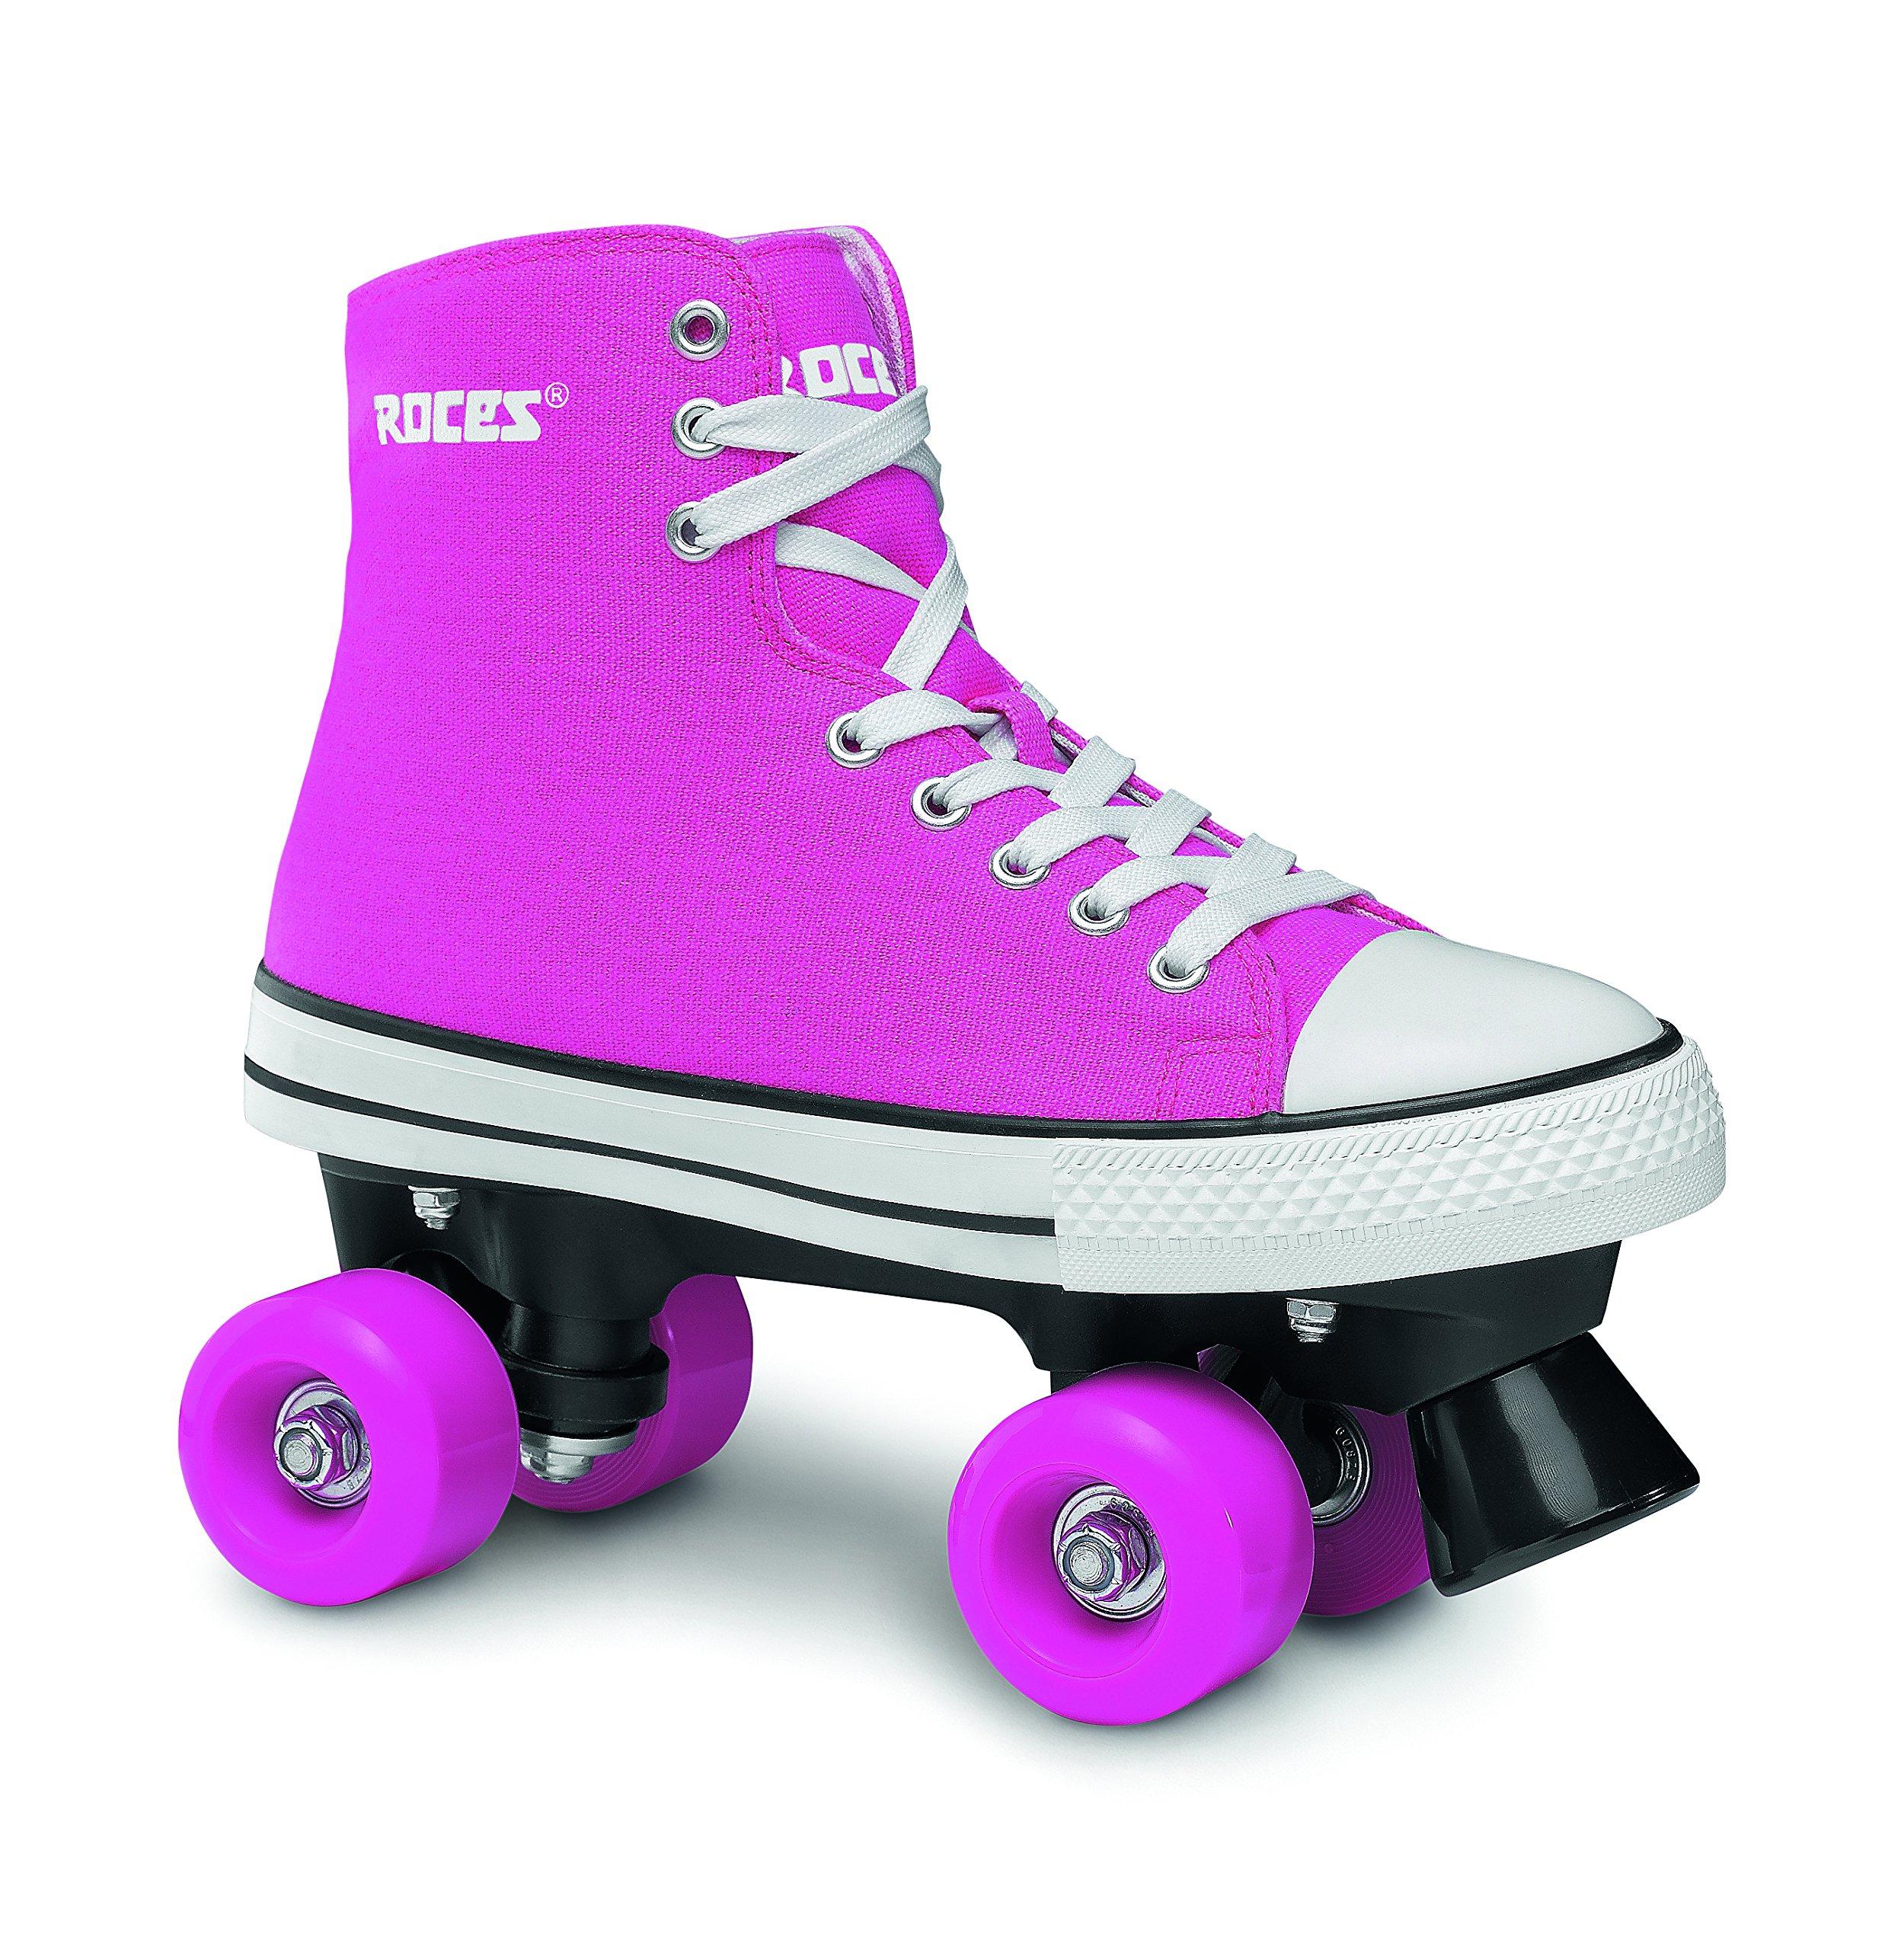 Roces 550030 Model Chuck Roller Skate,Deep Pink,4.5USW,2.5USM,35EU,2UK by Roces